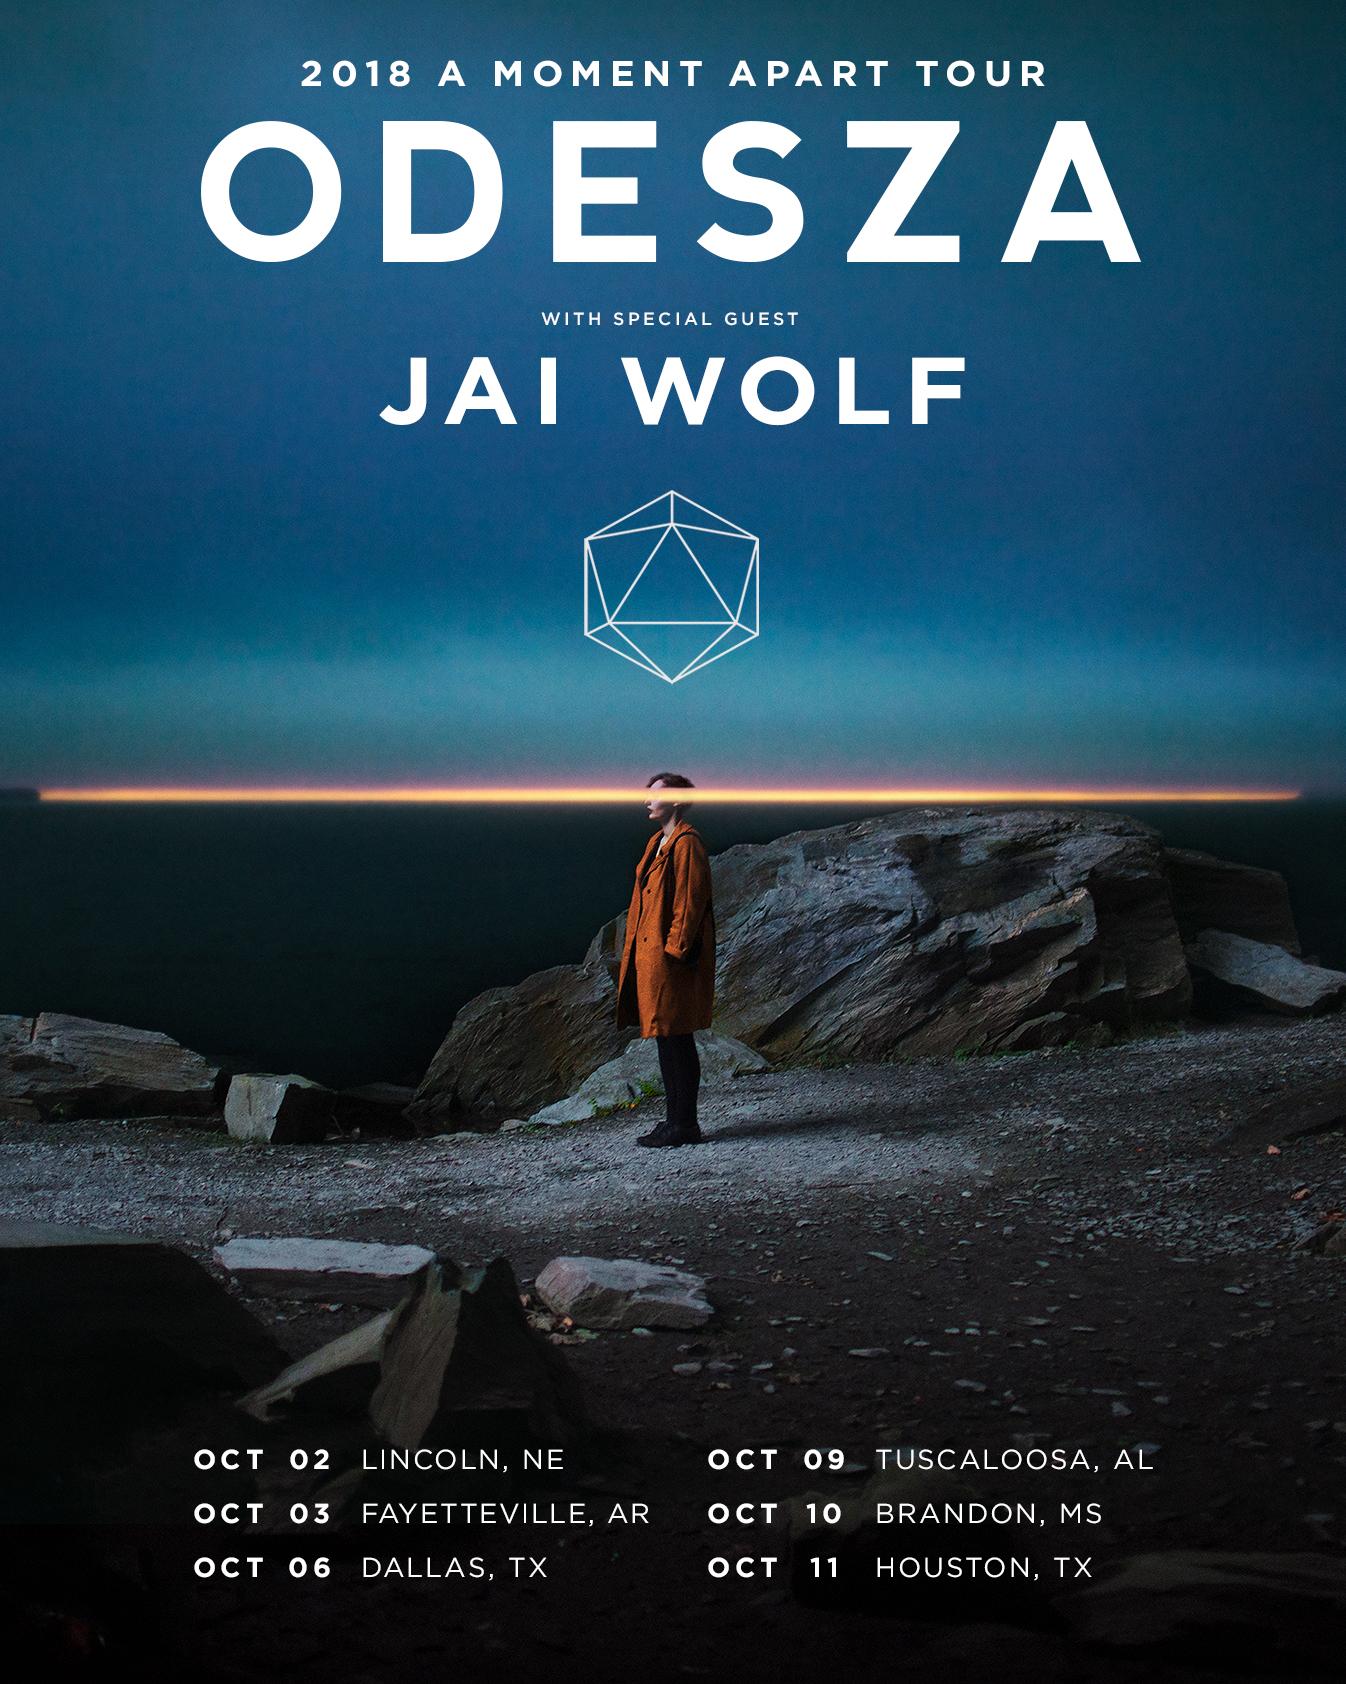 ODESZA_A-Moment-Apart_Admat_4x5_Support-Announce_Jai-Wolf.jpg